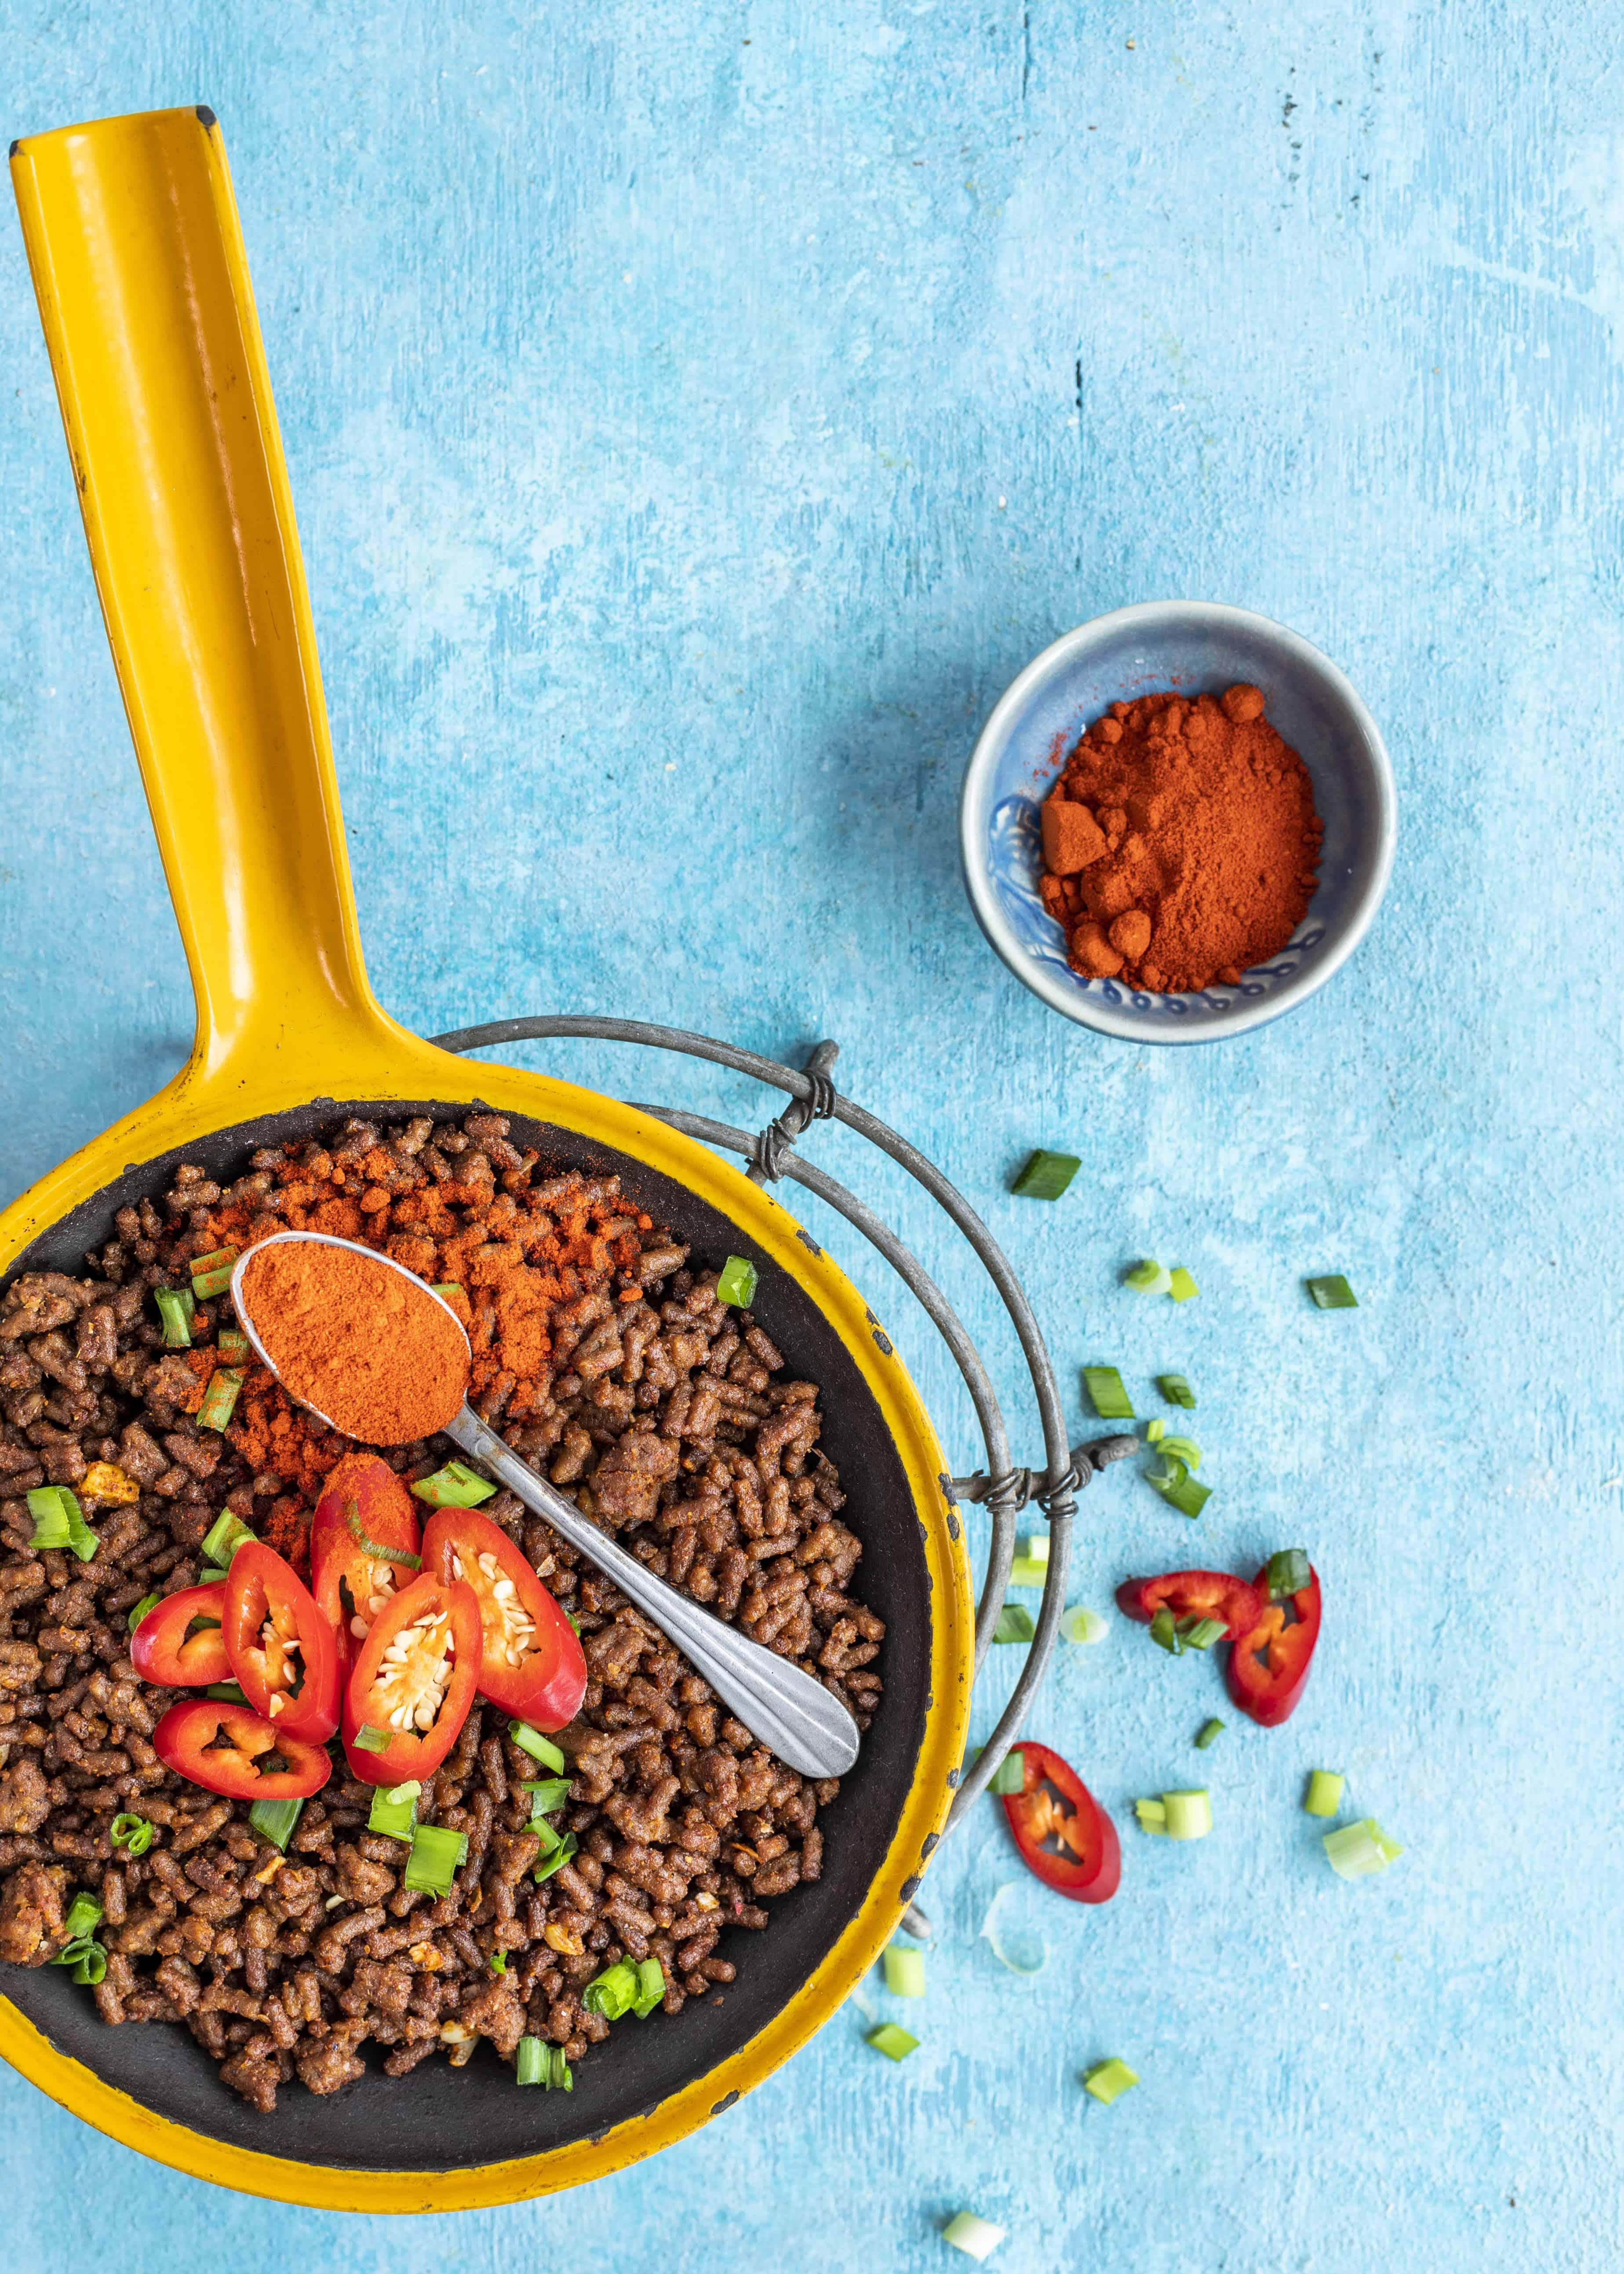 tacosalaatti, tacosalaatti kaurajauhiksella, kaurajauhis, lihankorvikkeet, paras lihankorvike, muru kaurajauhis